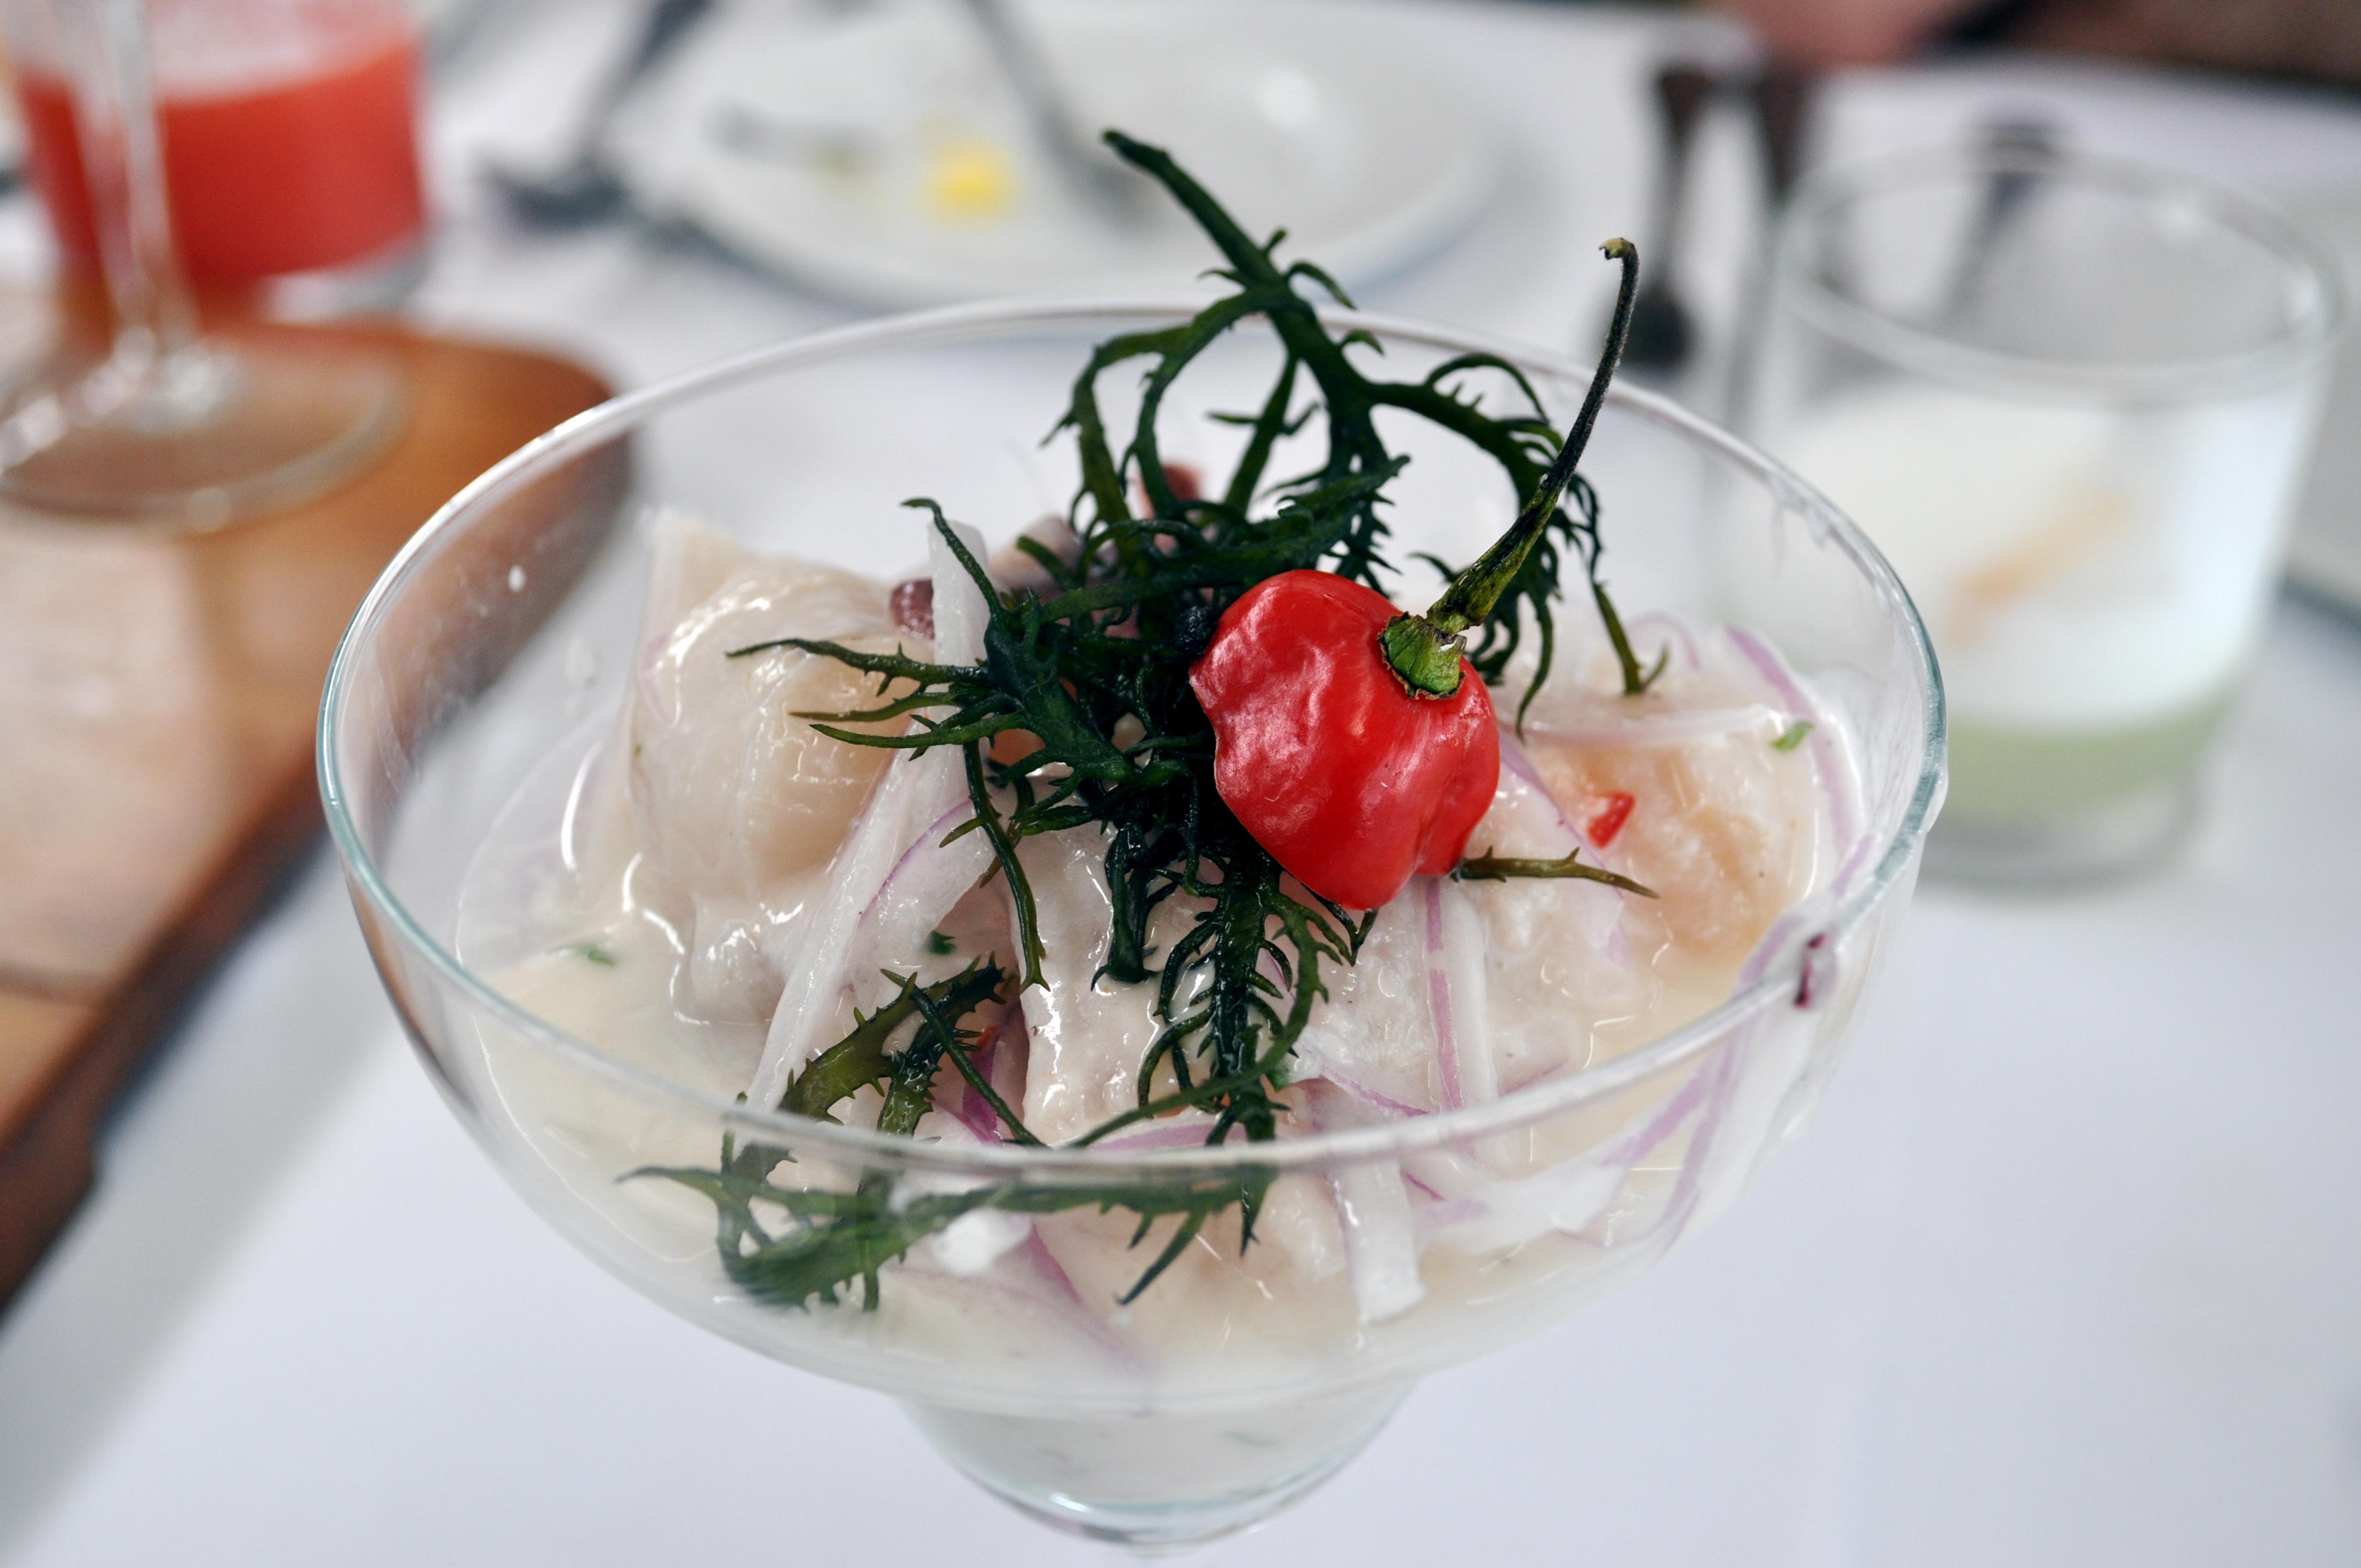 5 best Peruvian foods |Lima Peruvian Favorite Foods